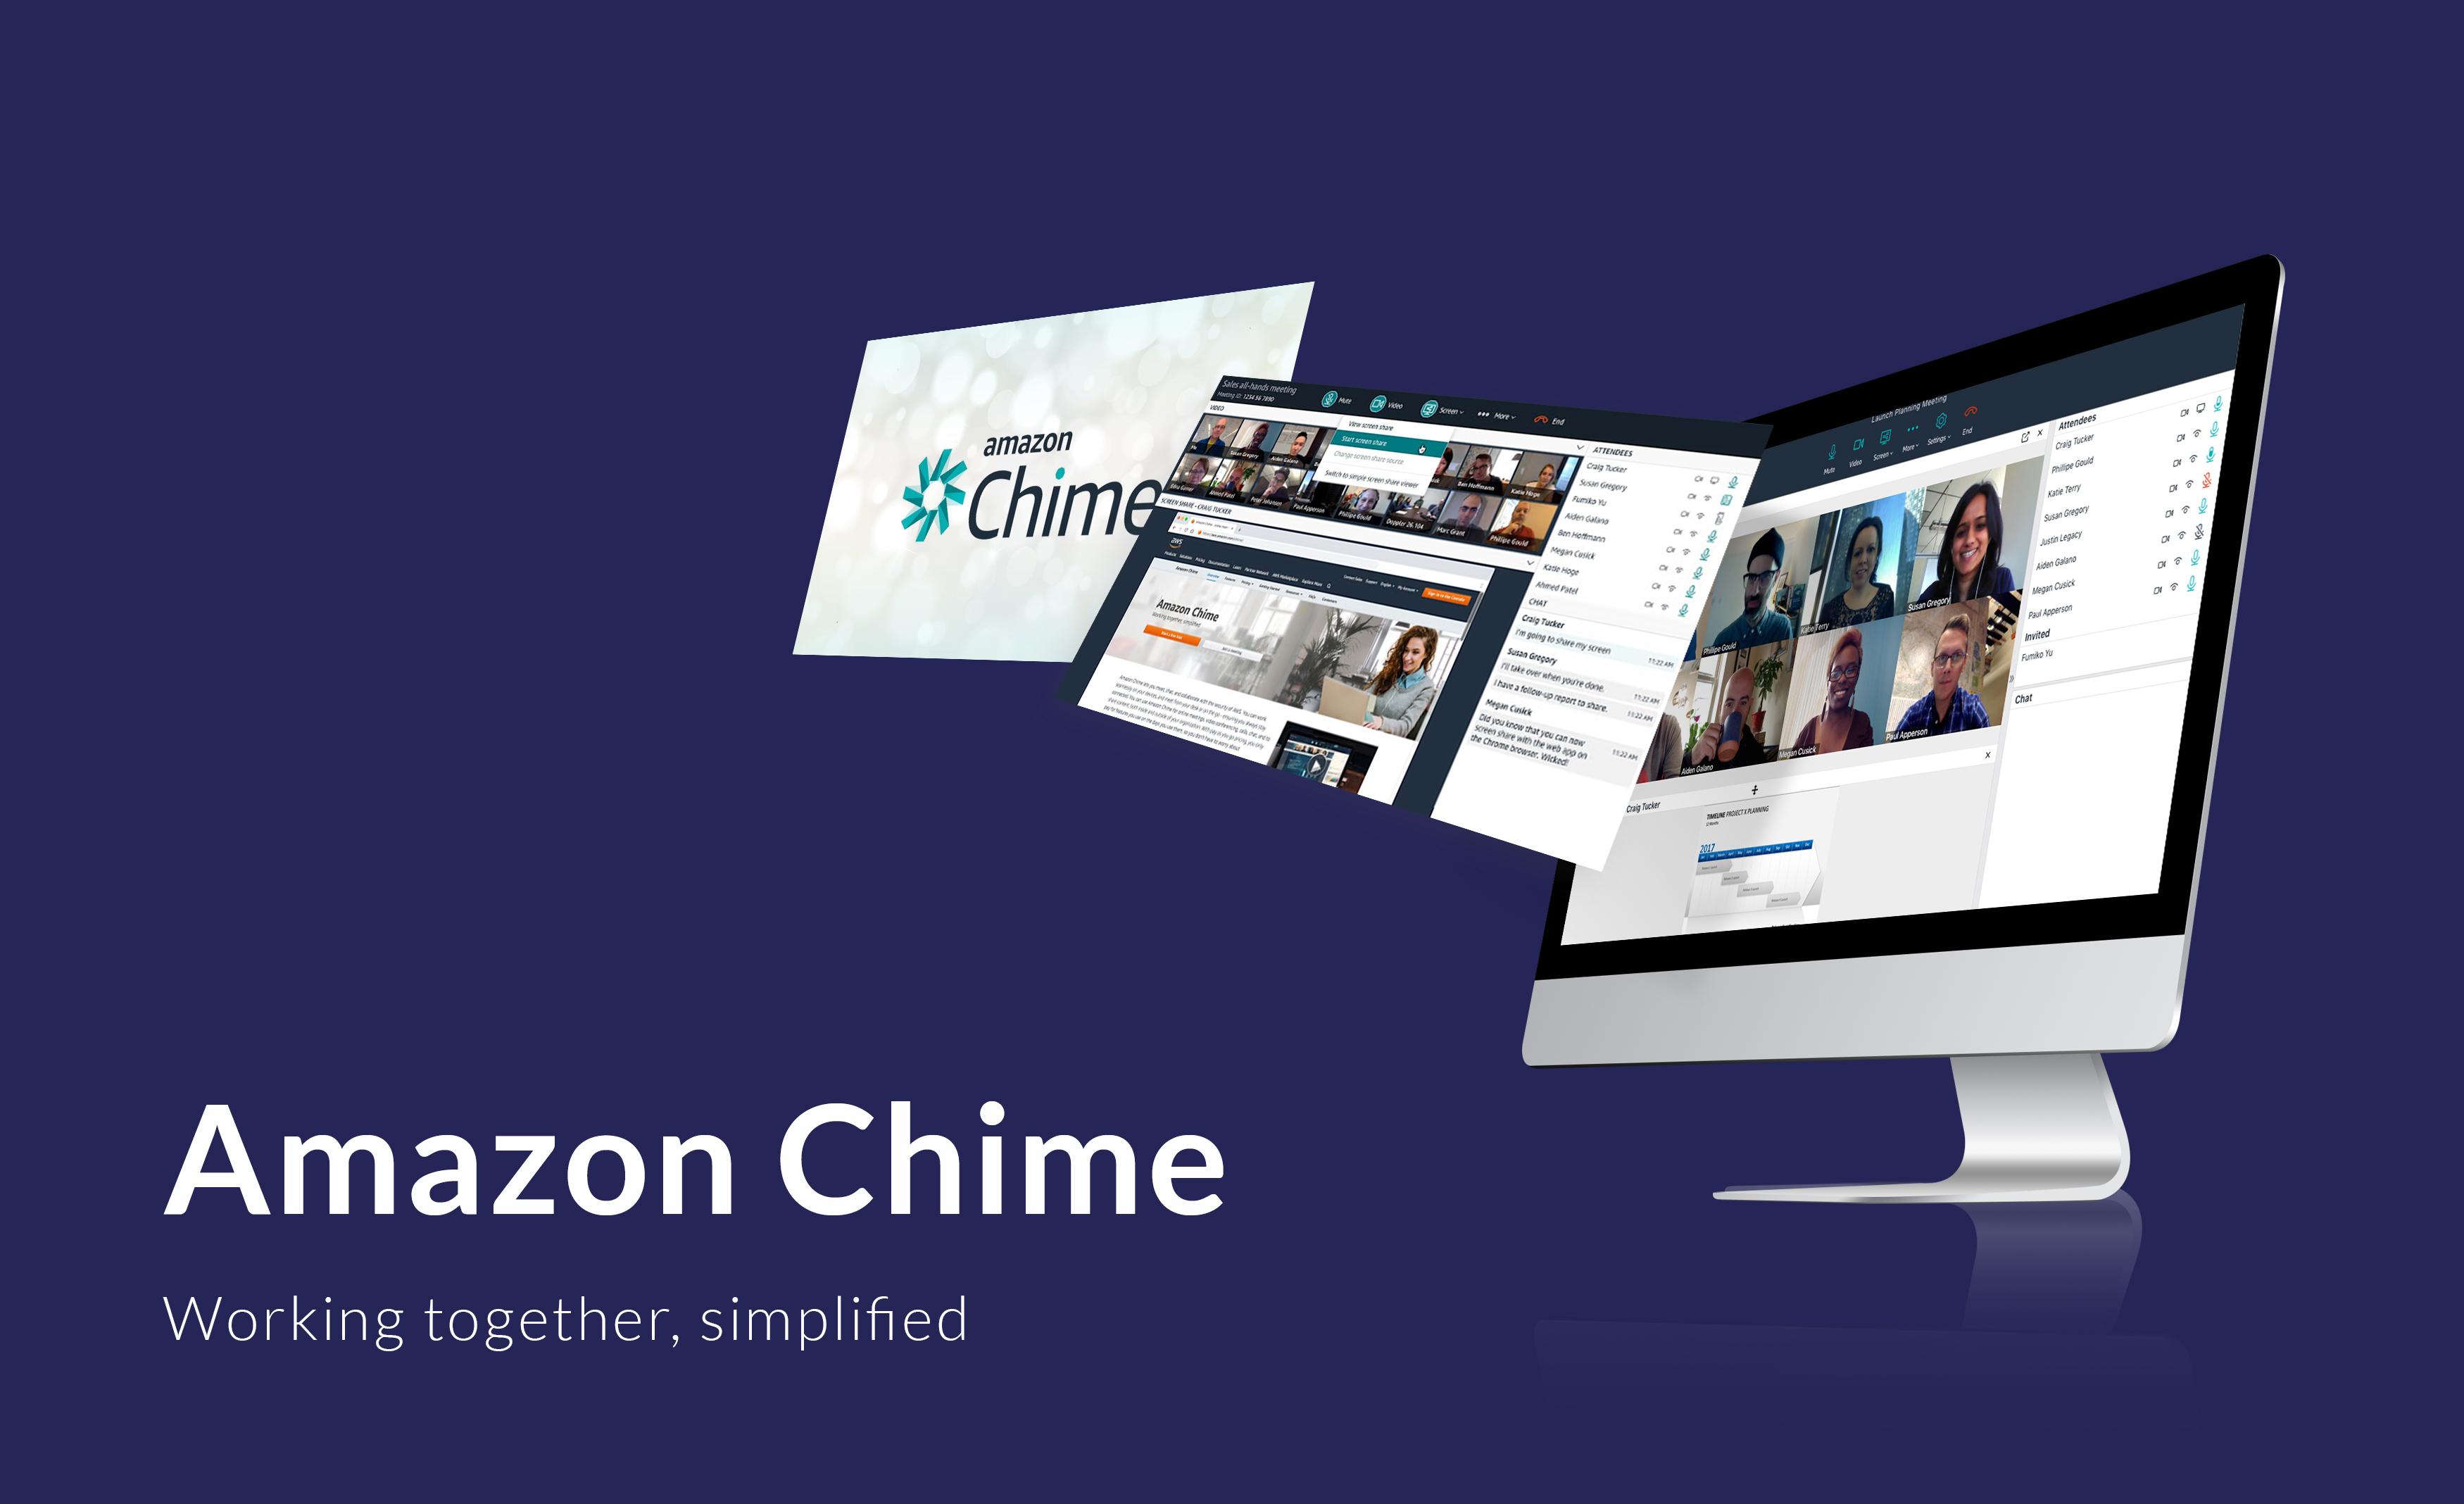 Amazon Chime